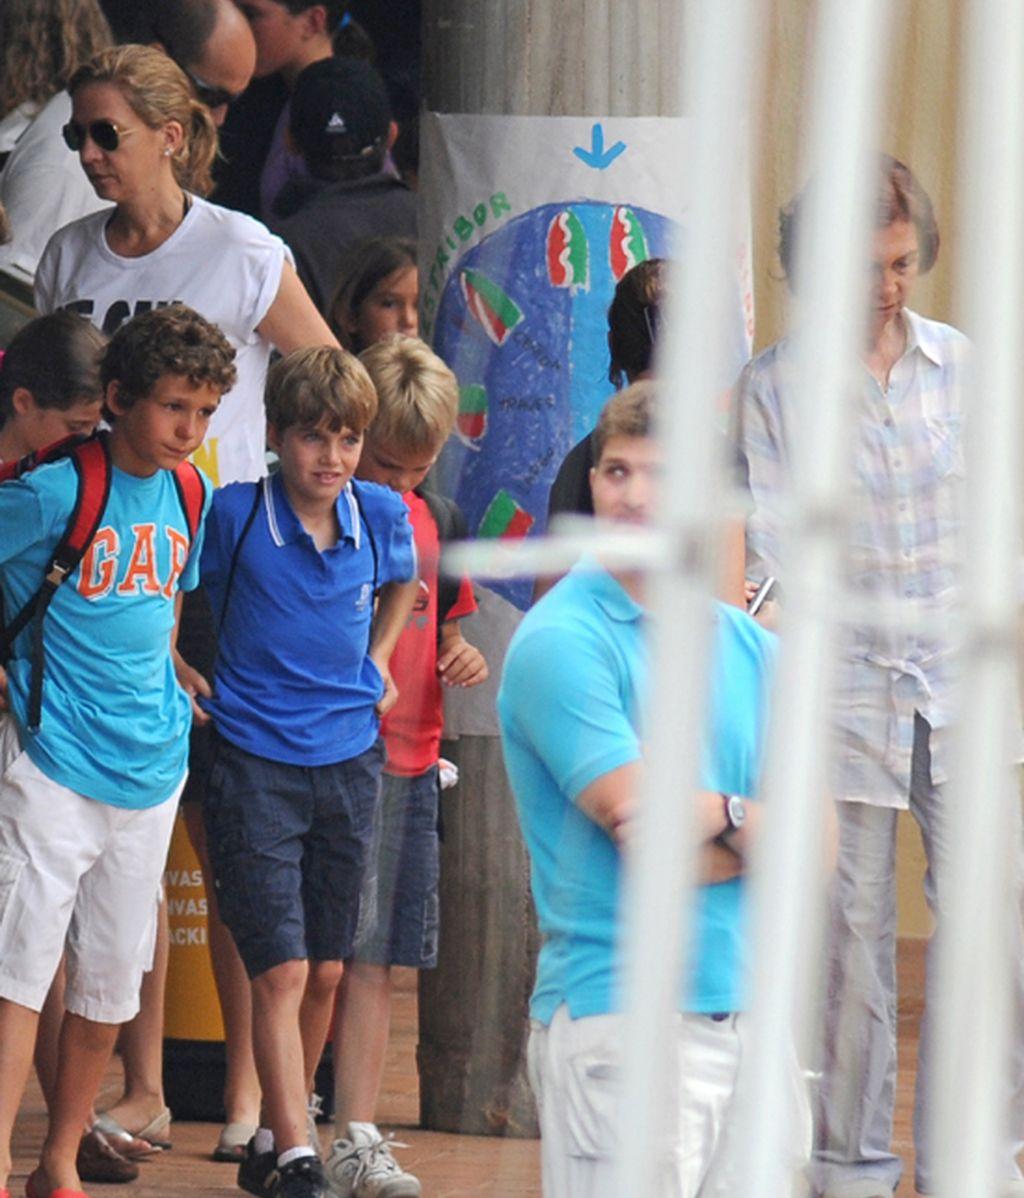 La familia real, al completo en Palma